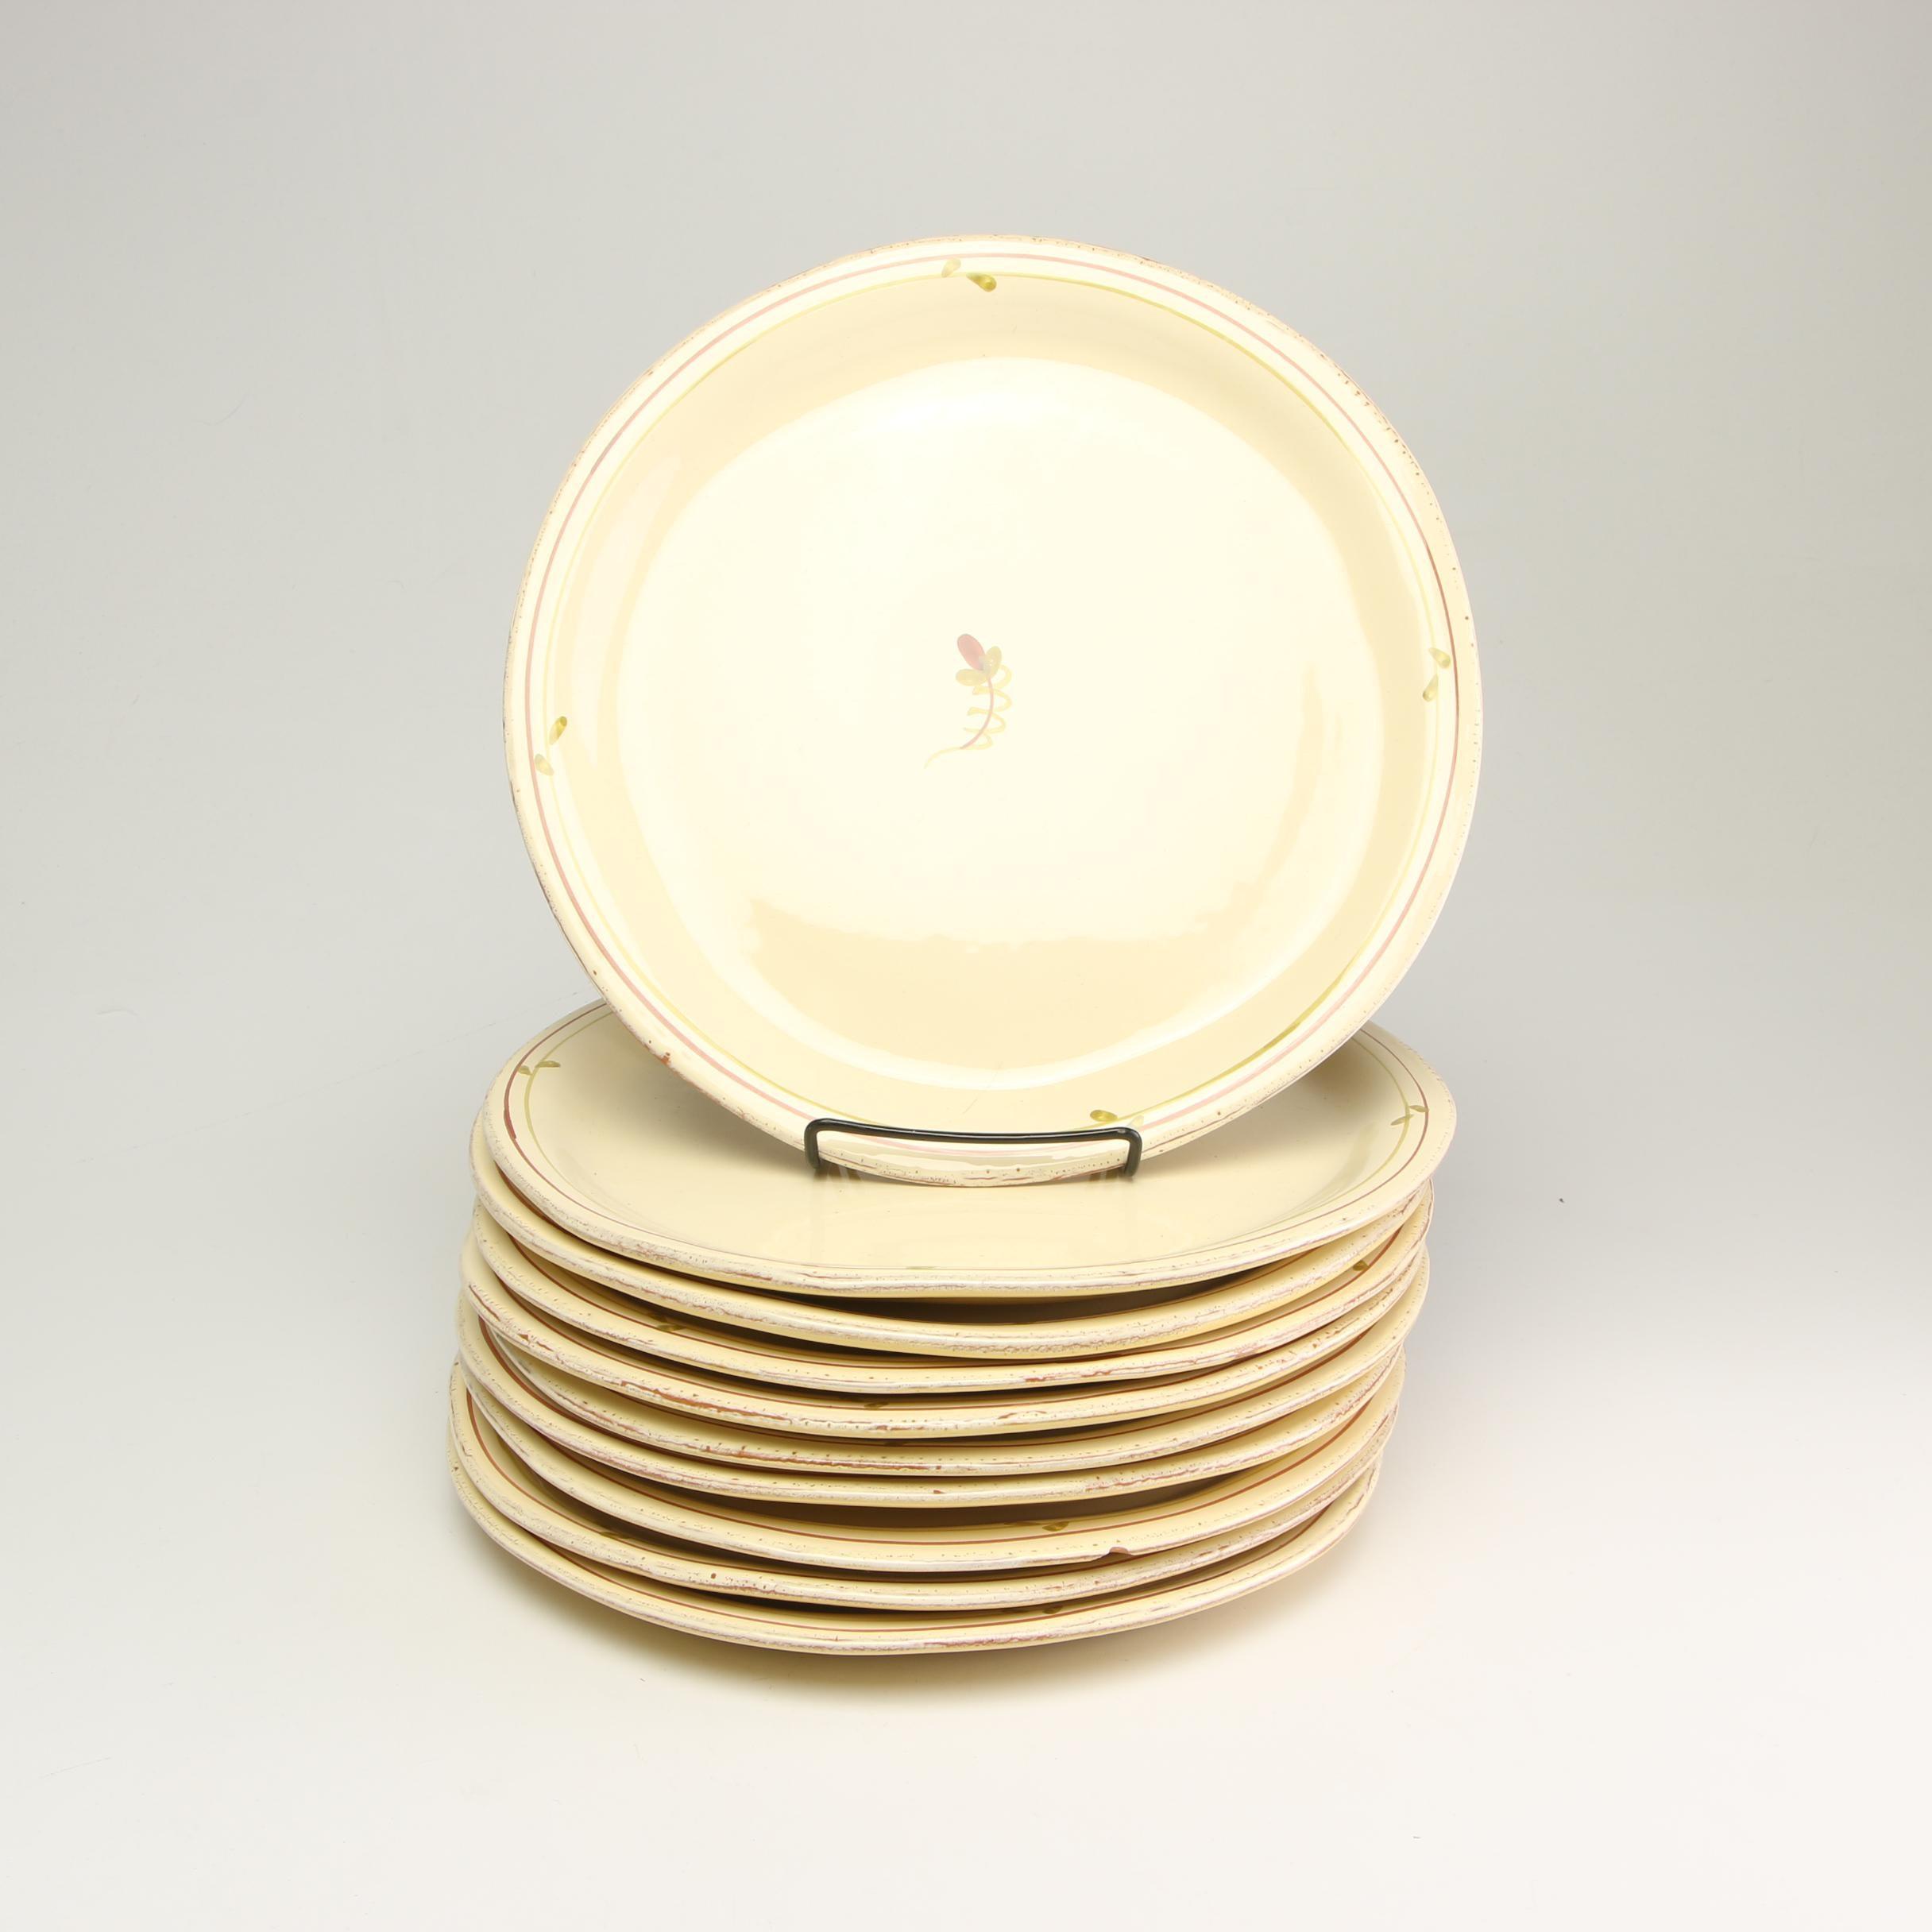 Vietri Italian Ceramic Dinner Plates